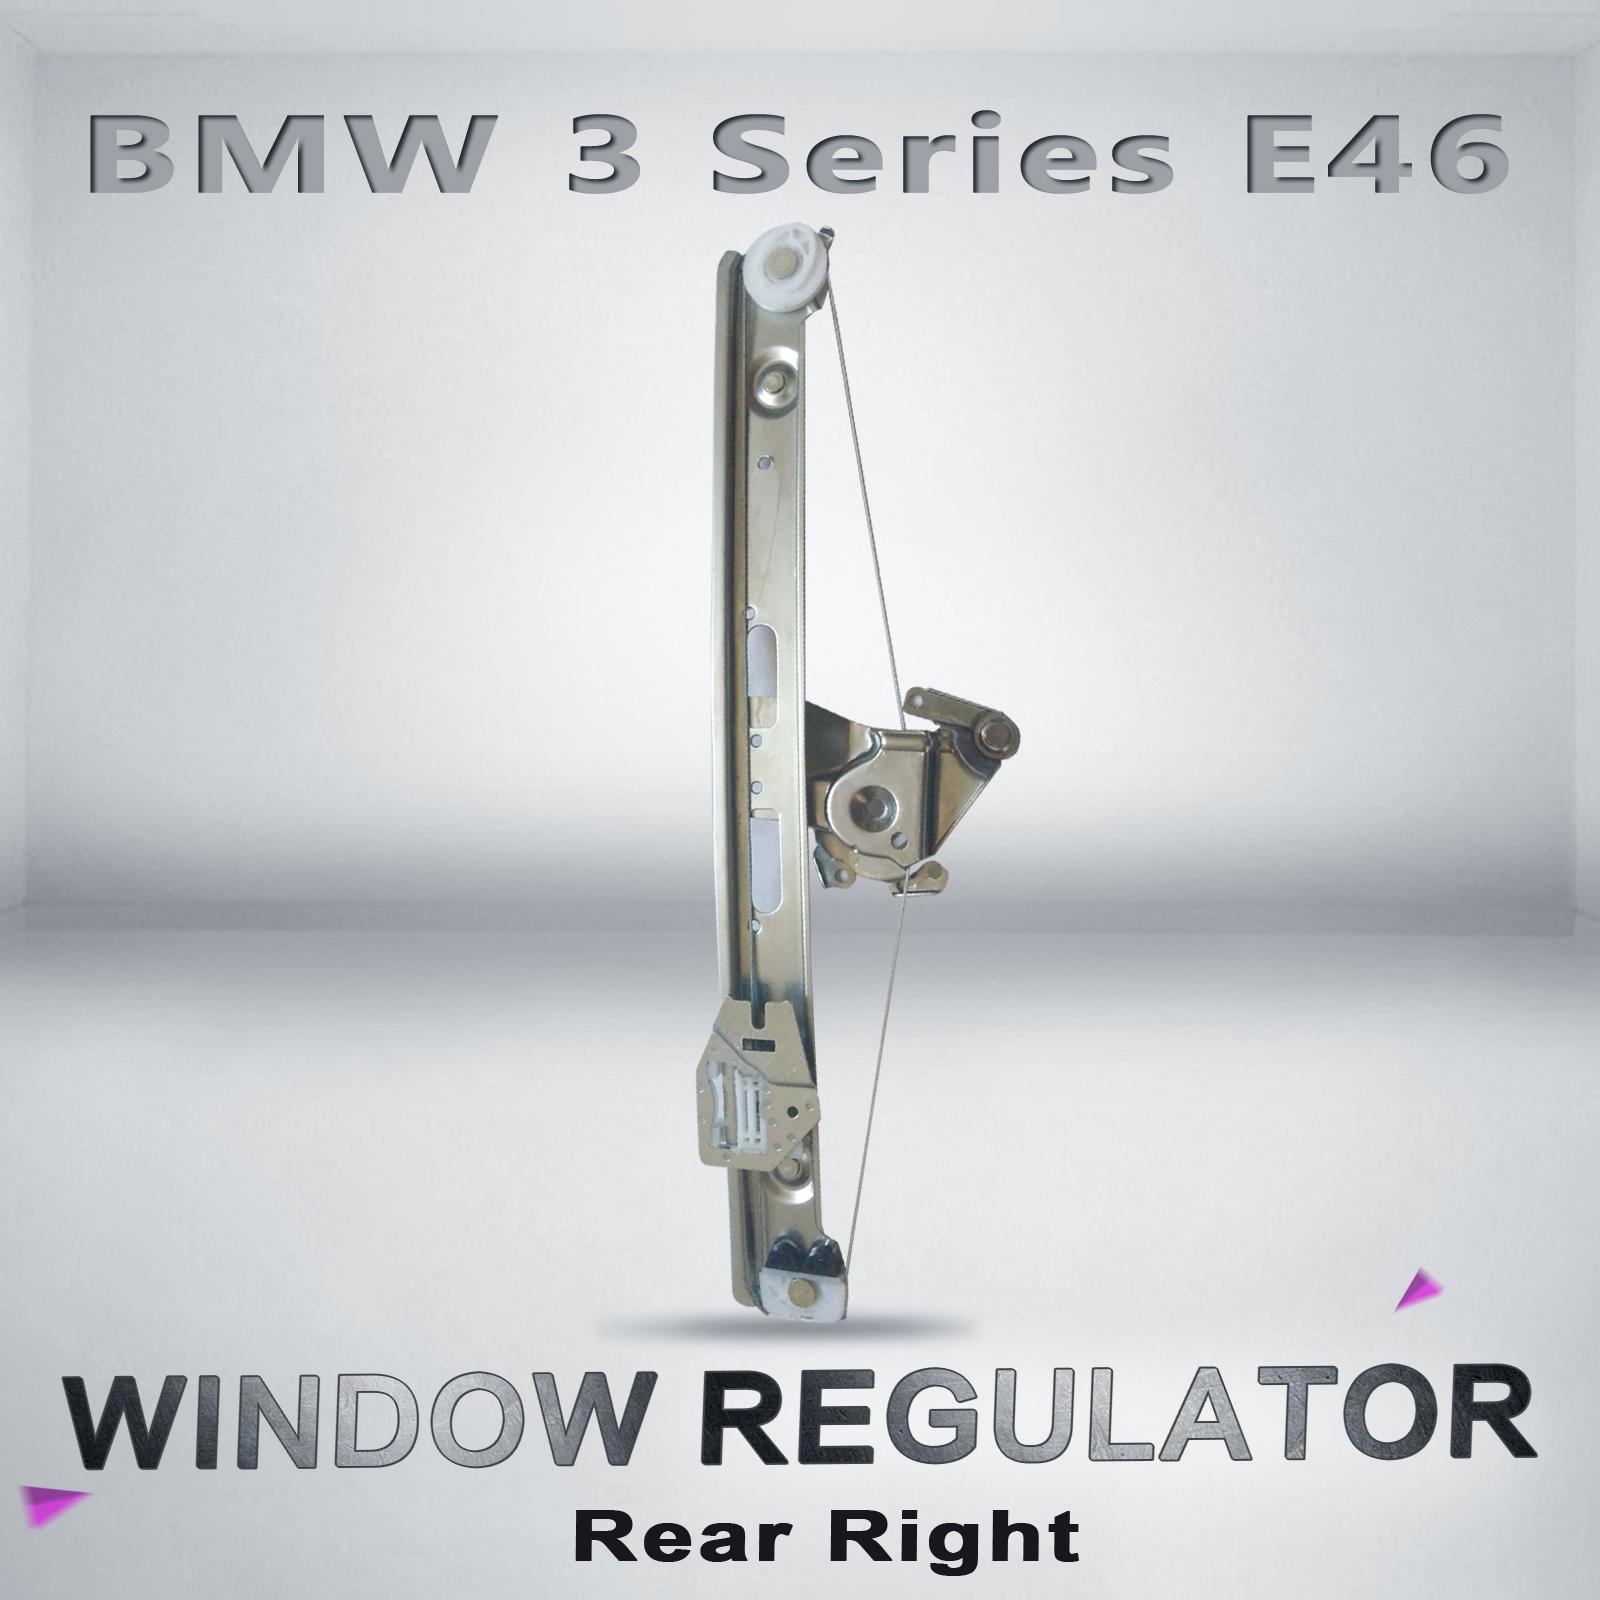 Bmw 3 series e46 window regulator sedan right hand rear for 2001 bmw 330i window regulator